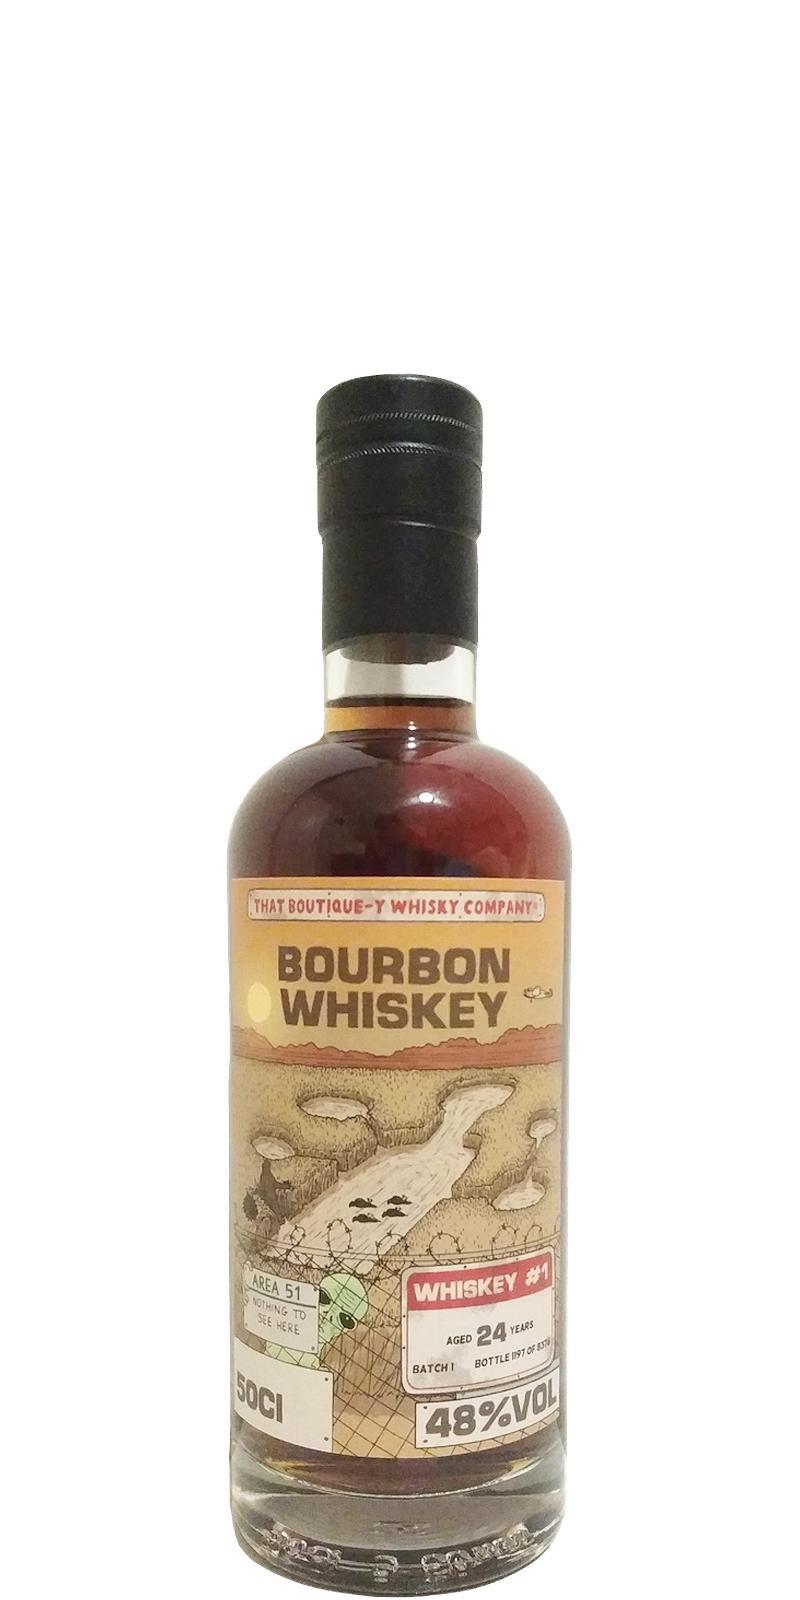 Bourbon Whiskey #1 TBWC